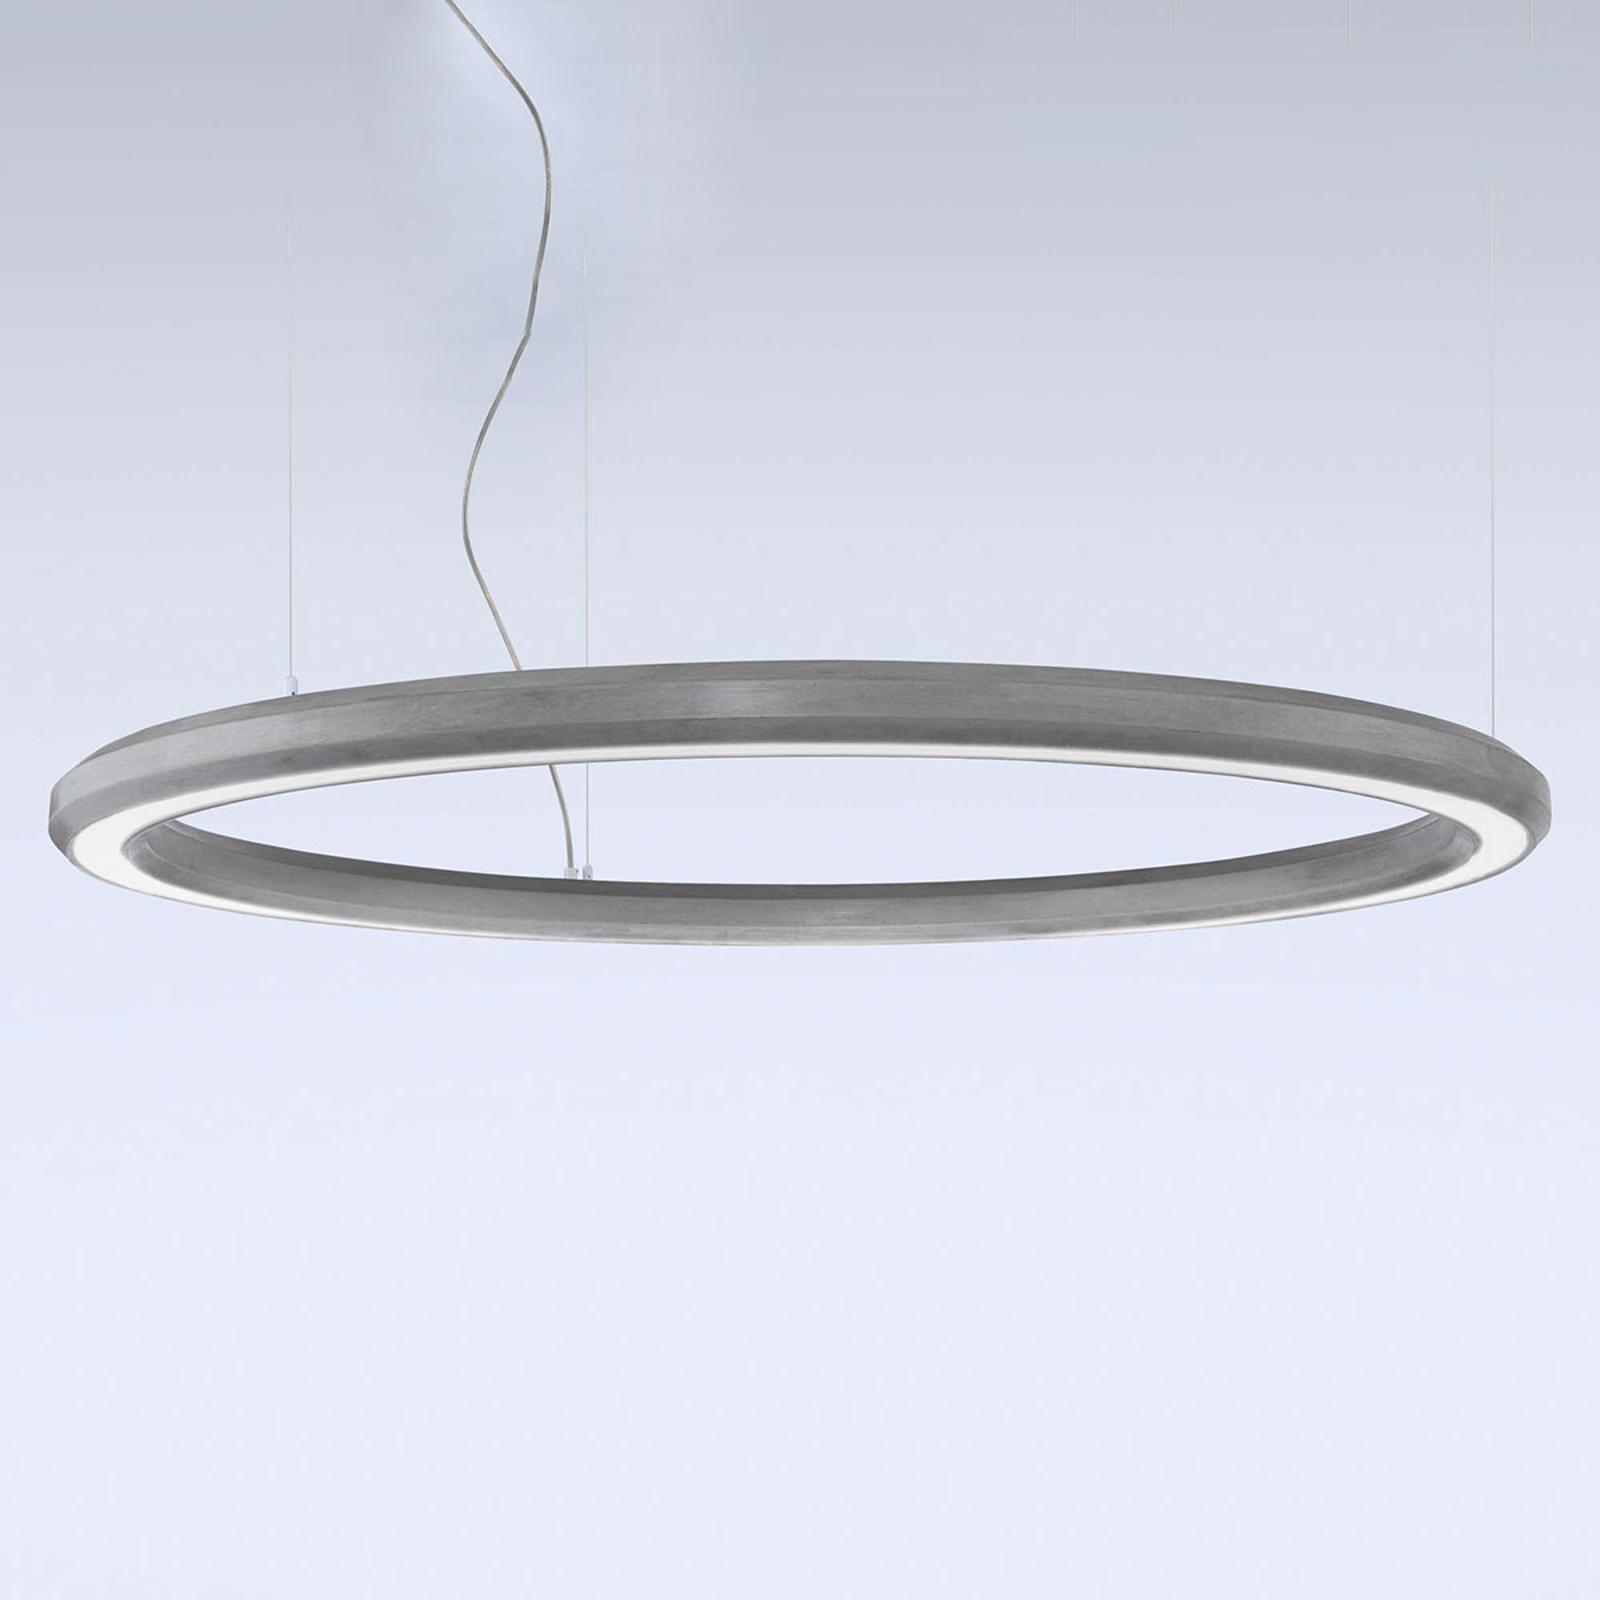 LED-Hängeleuchte Materica unten Ø 120 cm beton